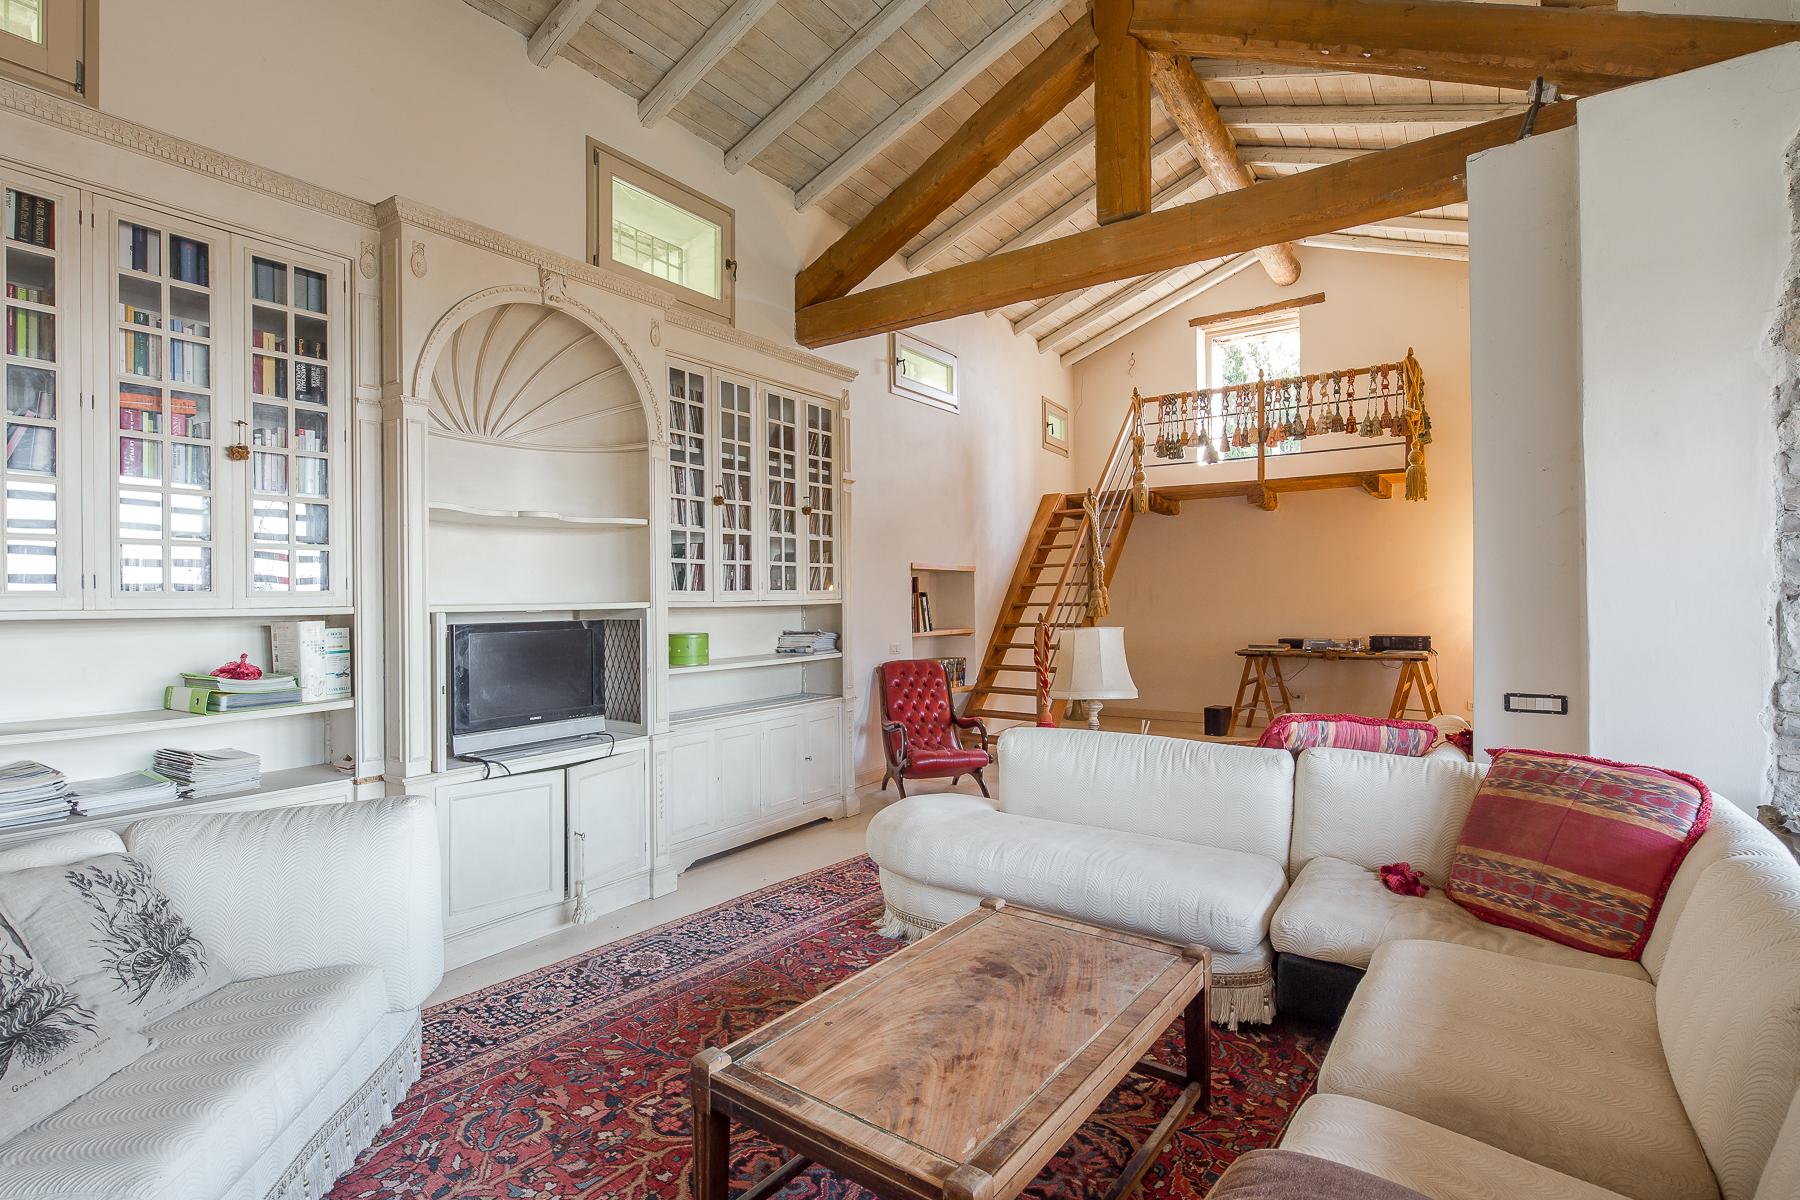 Casa indipendente in Vendita a Caprino Bergamasco: 5 locali, 500 mq - Foto 7